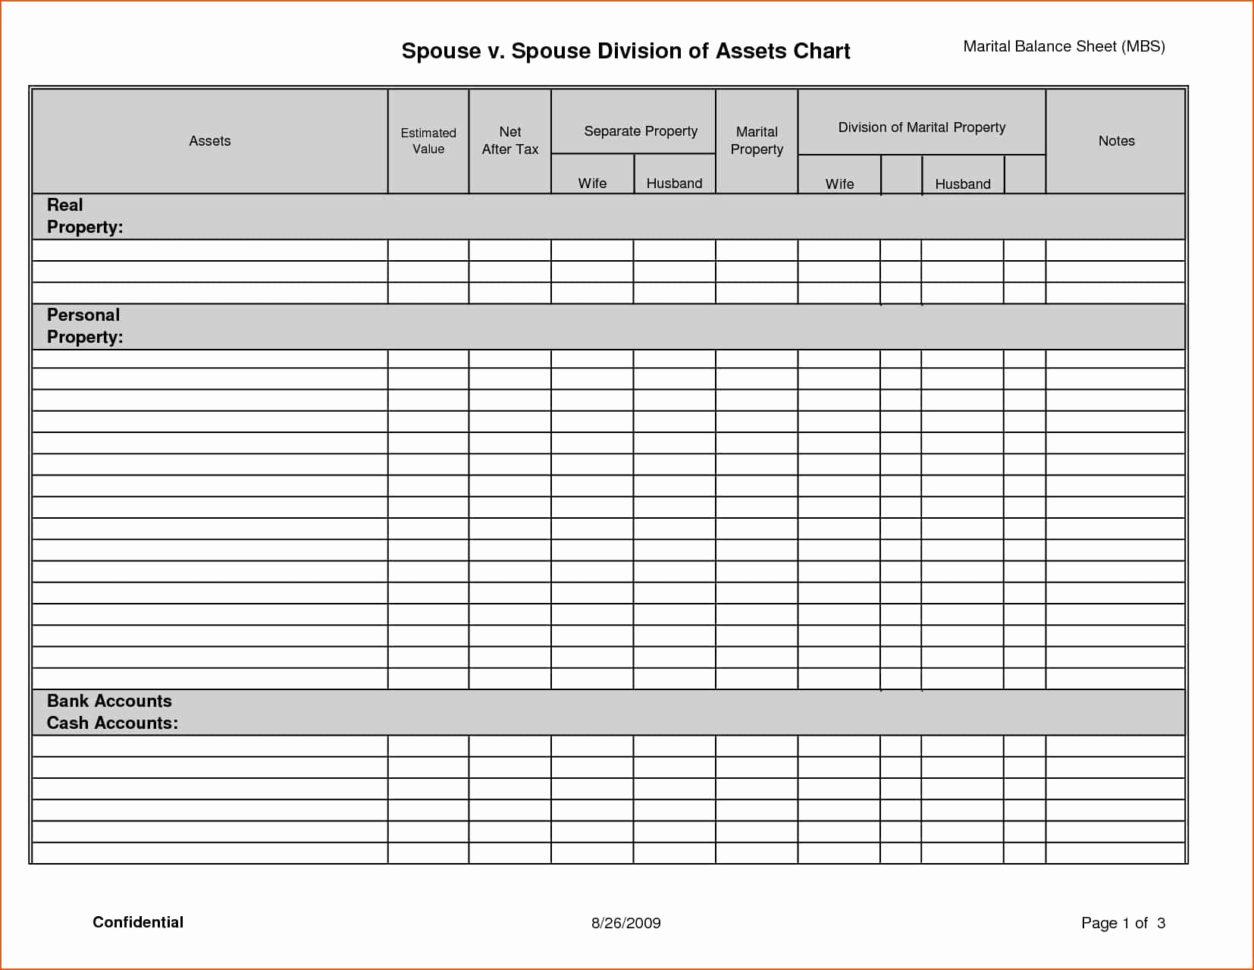 Vending Machine Inventory Spreadsheet Inspirational Vending Machine Intended For Vending Machine Inventory Spreadsheet